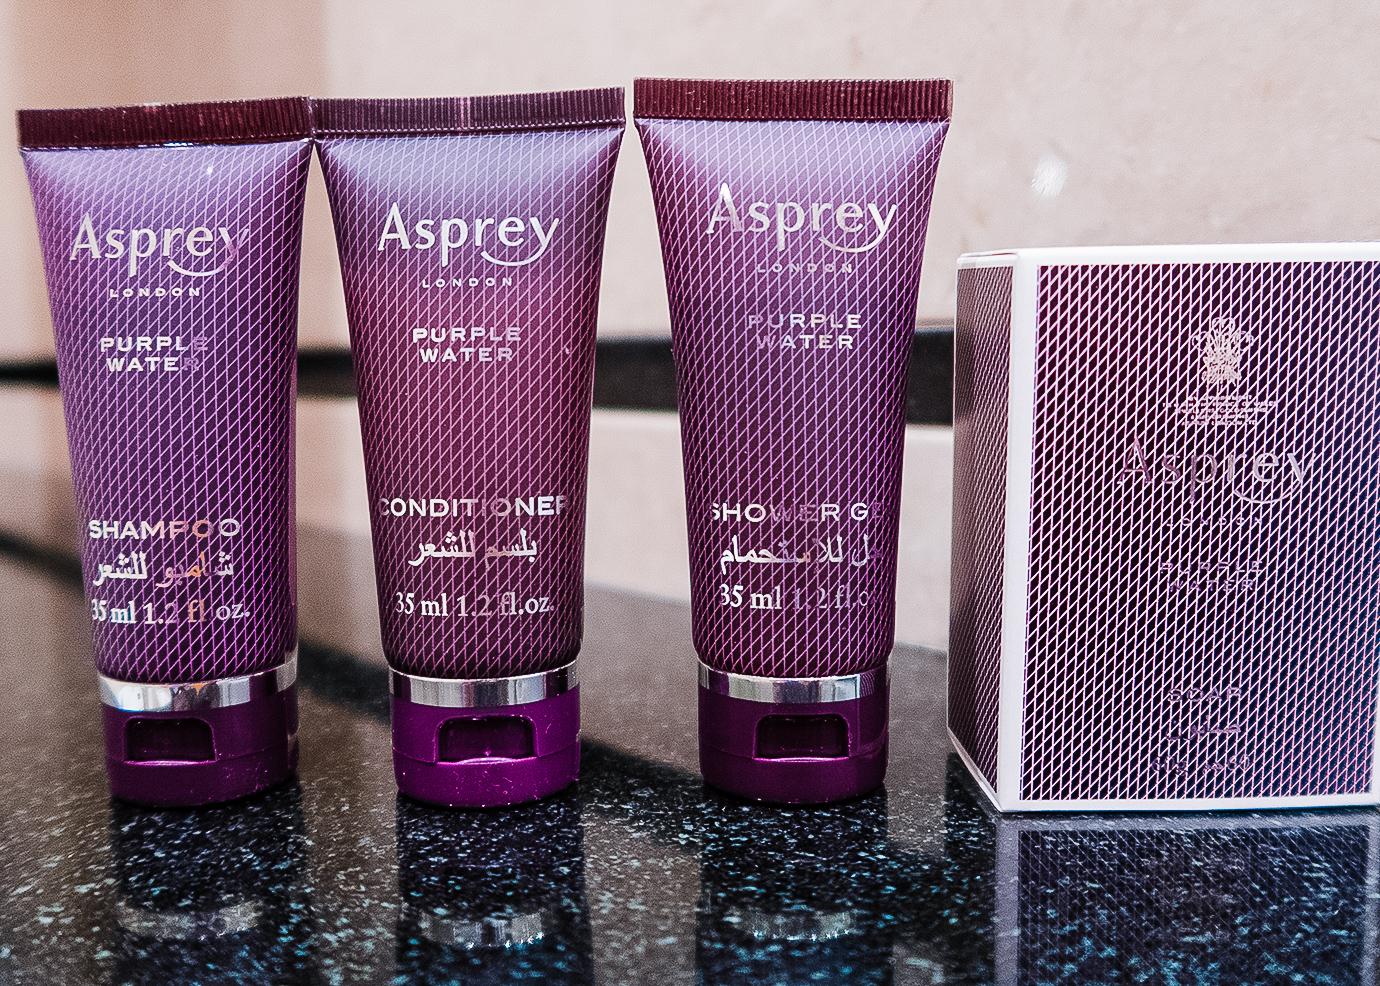 Asprey of London toiletries at Ritz Carlton of Saudi Arabia